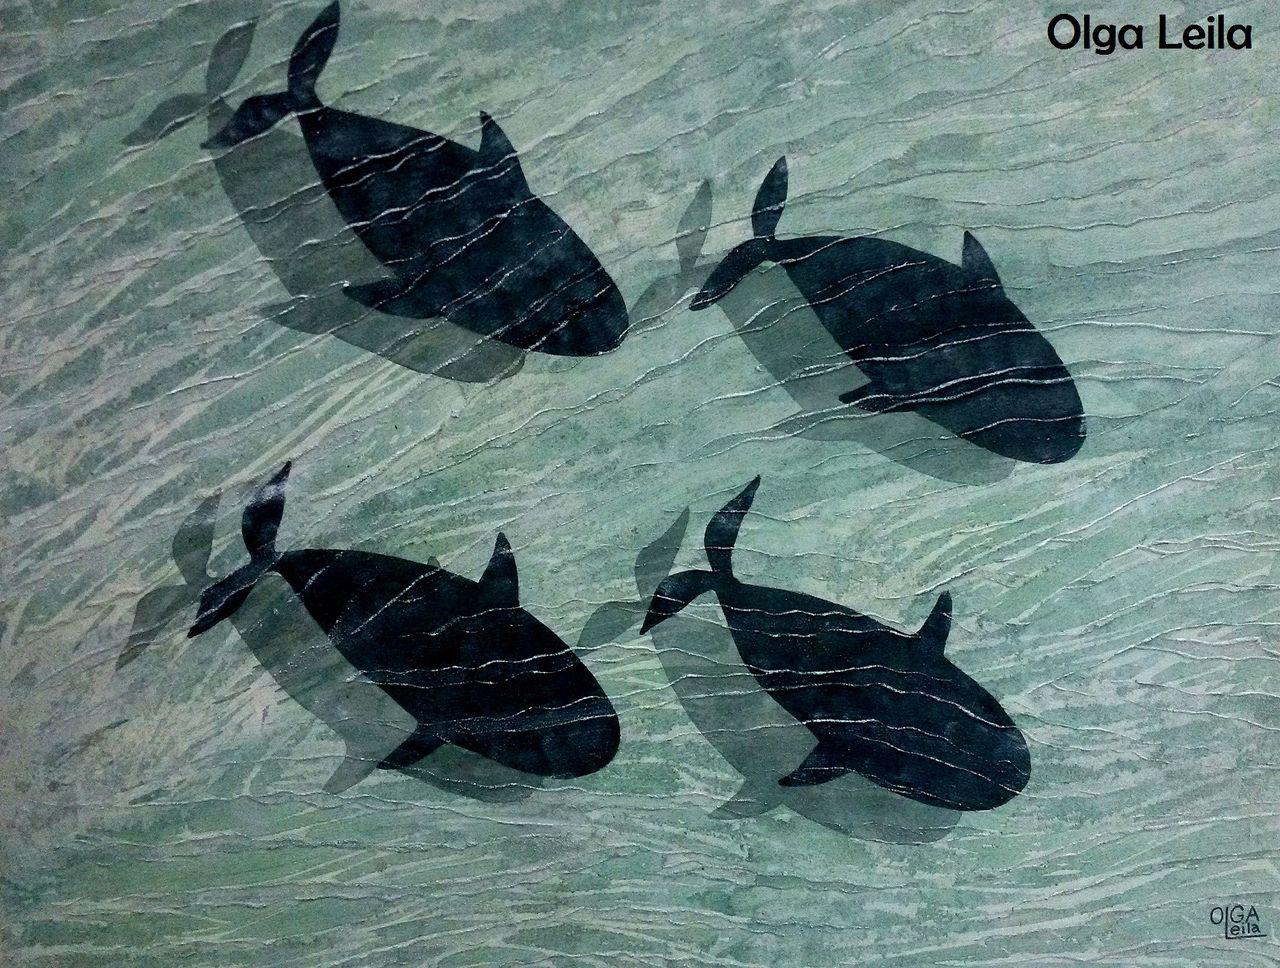 Olga  Leila Les baleines. Peinture acrylique sur toile 150 X 100